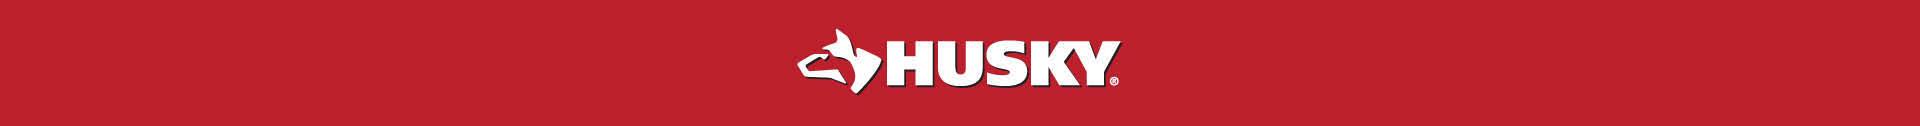 Husky Brand Banner